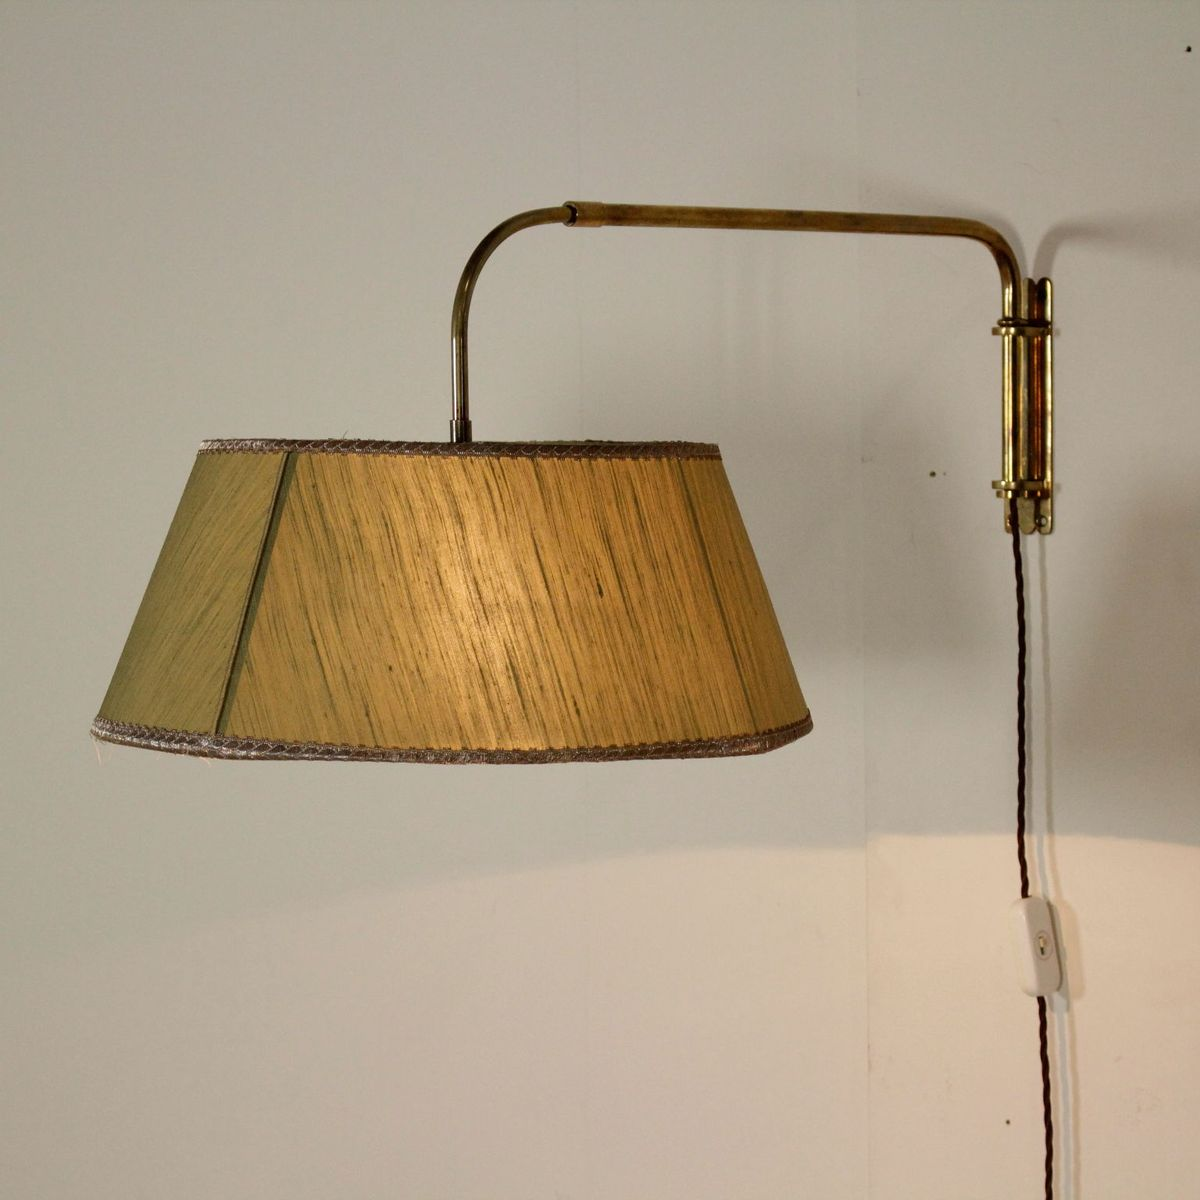 ausziehbare messing wandlampe 1950er bei pamono kaufen. Black Bedroom Furniture Sets. Home Design Ideas